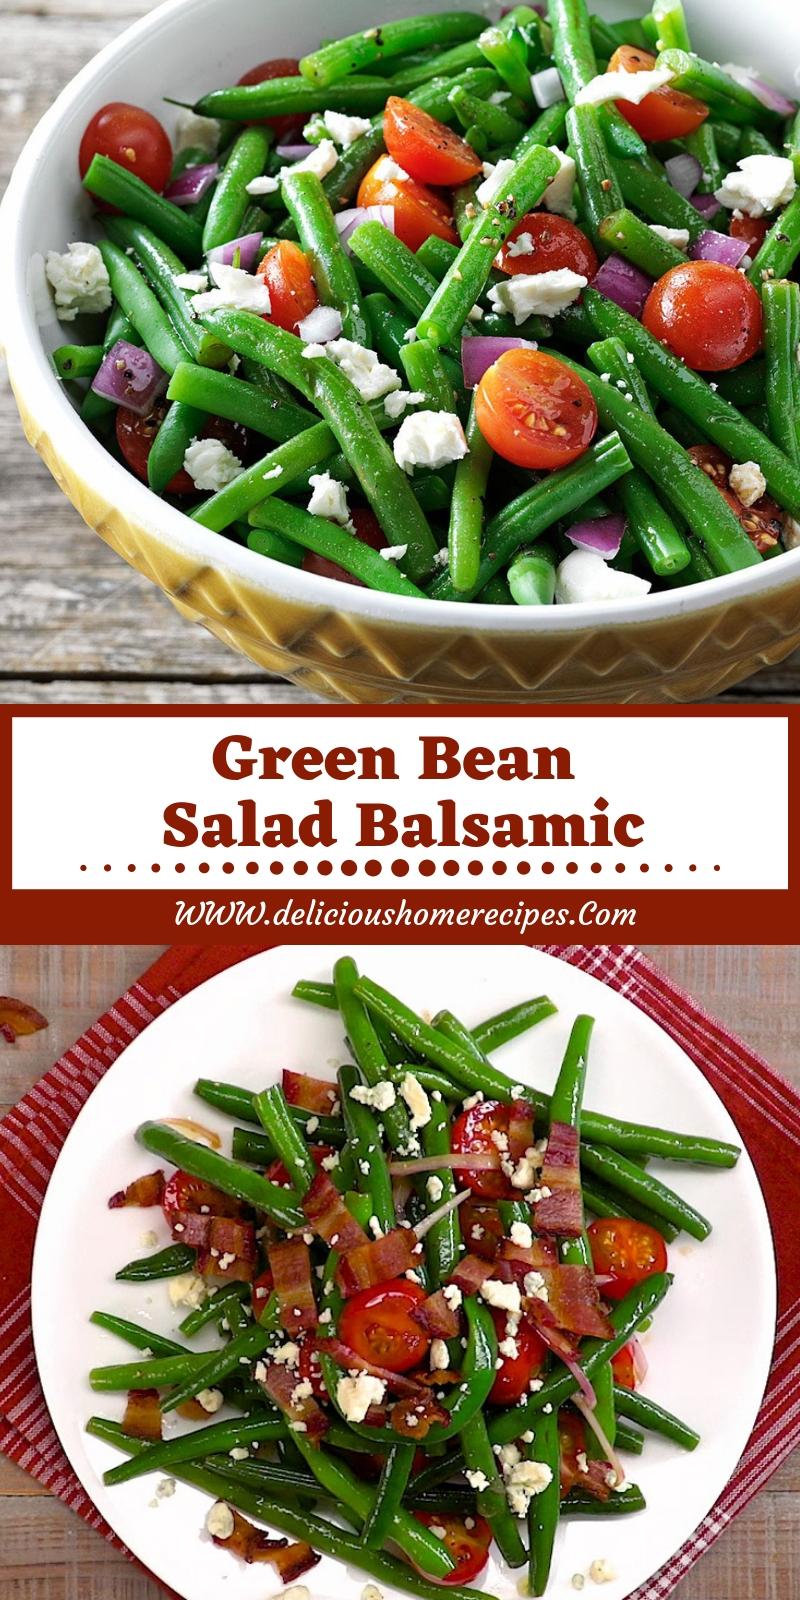 Green Bean Salad Balsamic